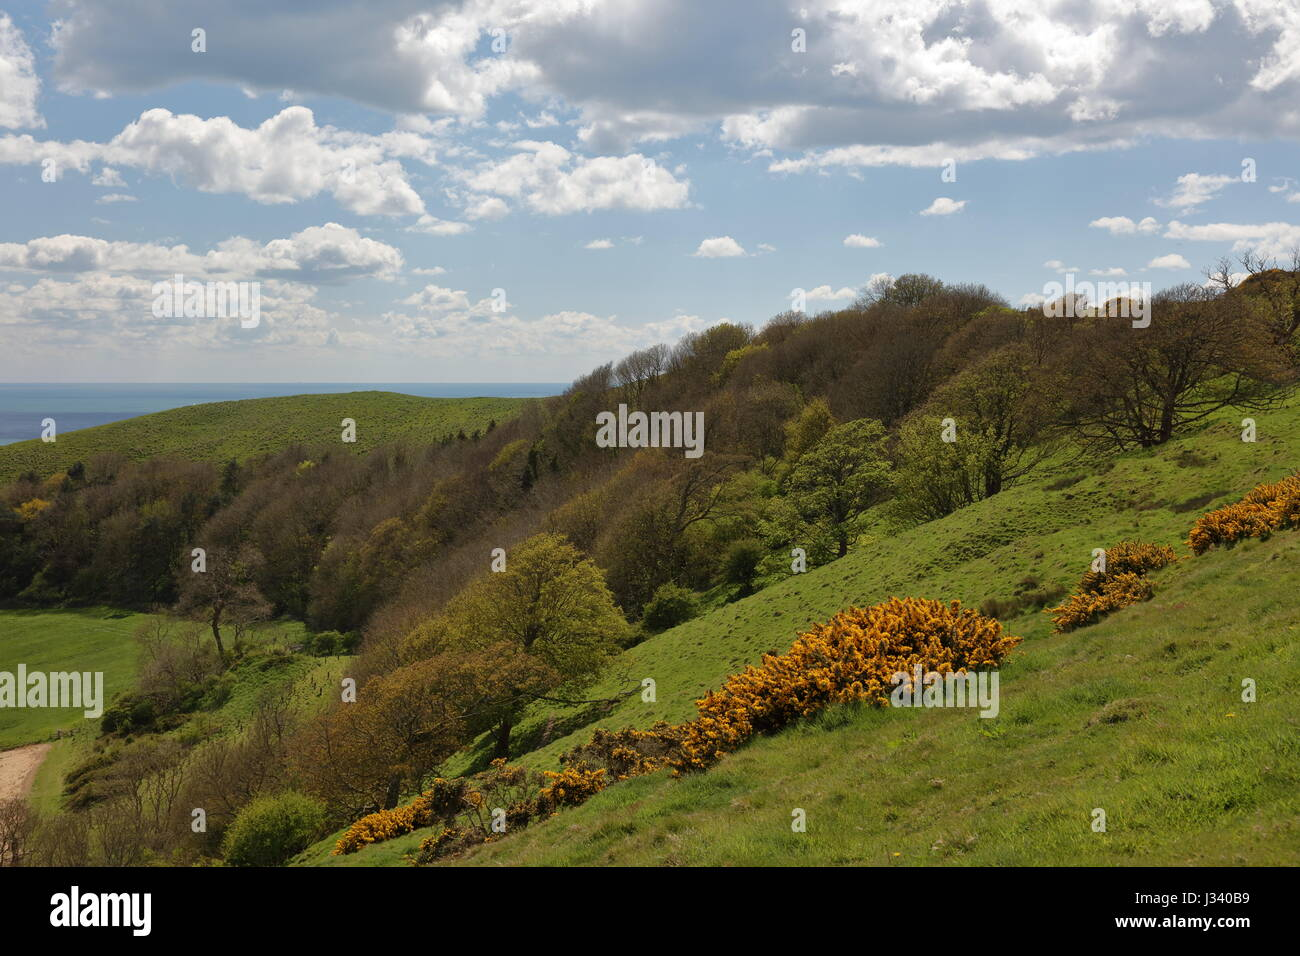 Naranja brillante primavera retamas y amplio paisaje fresco sudoeste hacia la cabeza Swyre Dorset UK Foto de stock